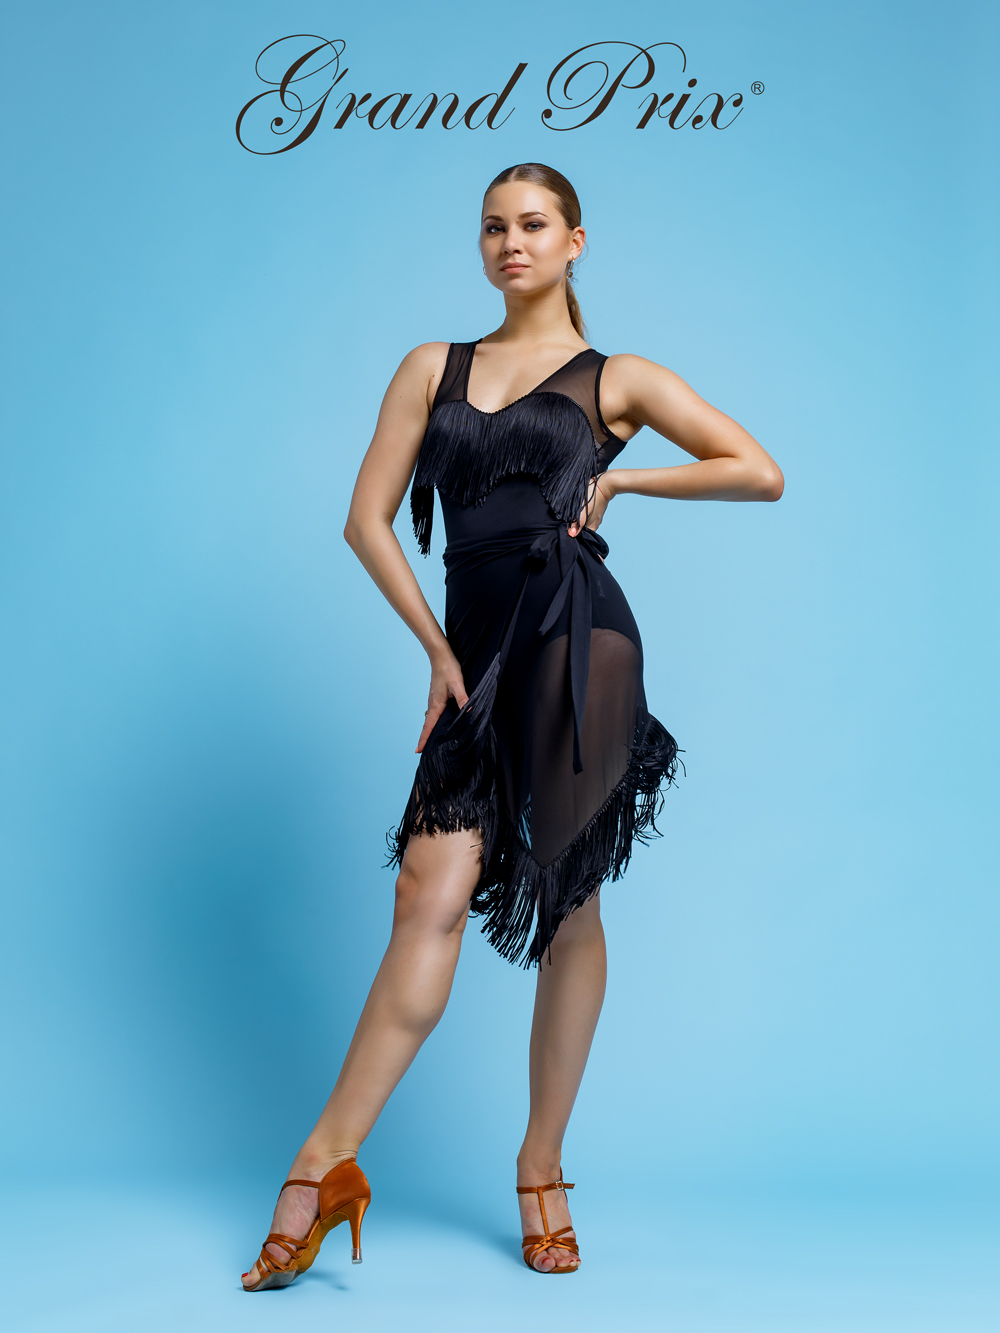 grandprix, ballroom dance brand